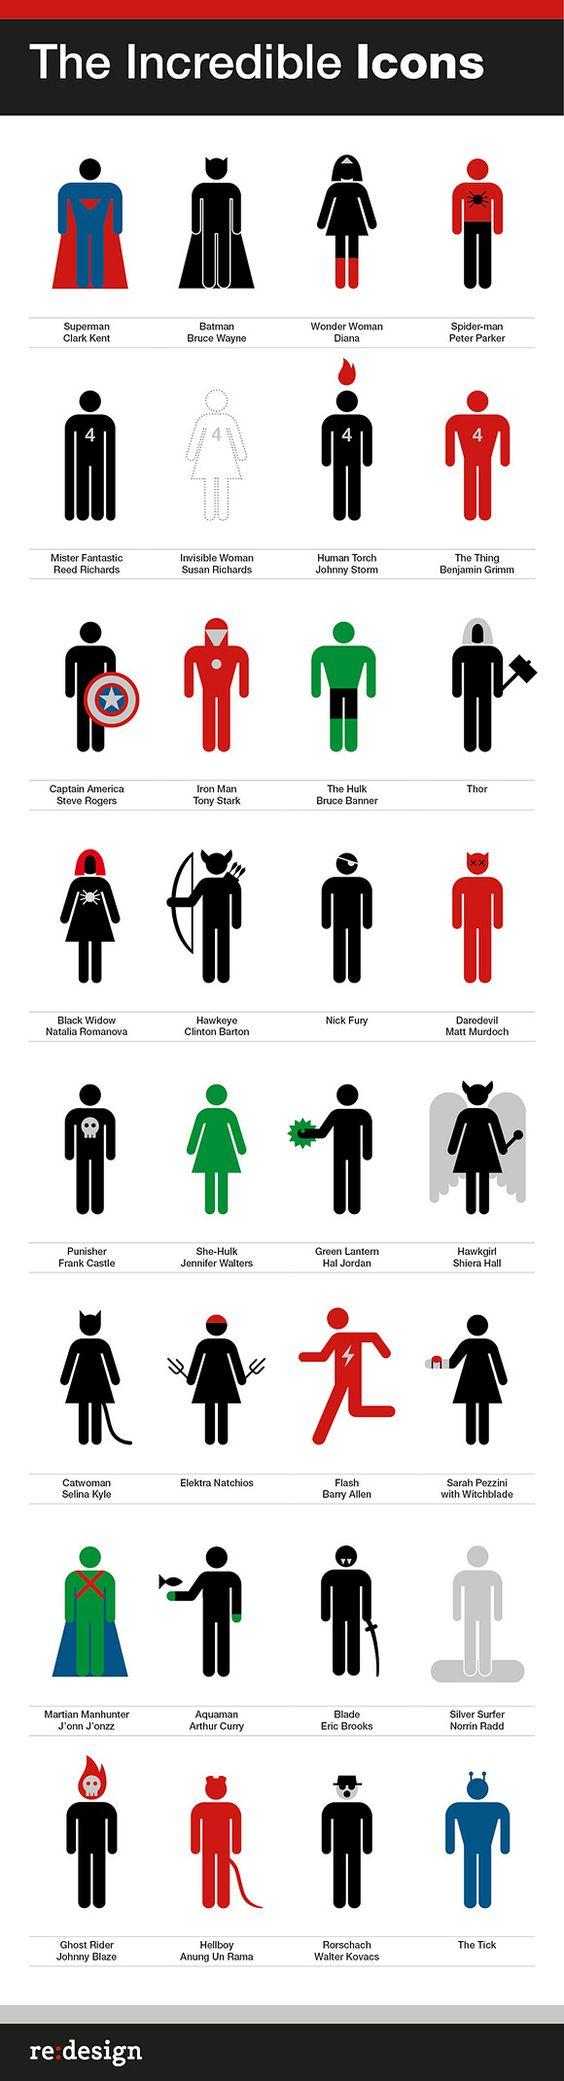 Superheroes + Supervillains icons